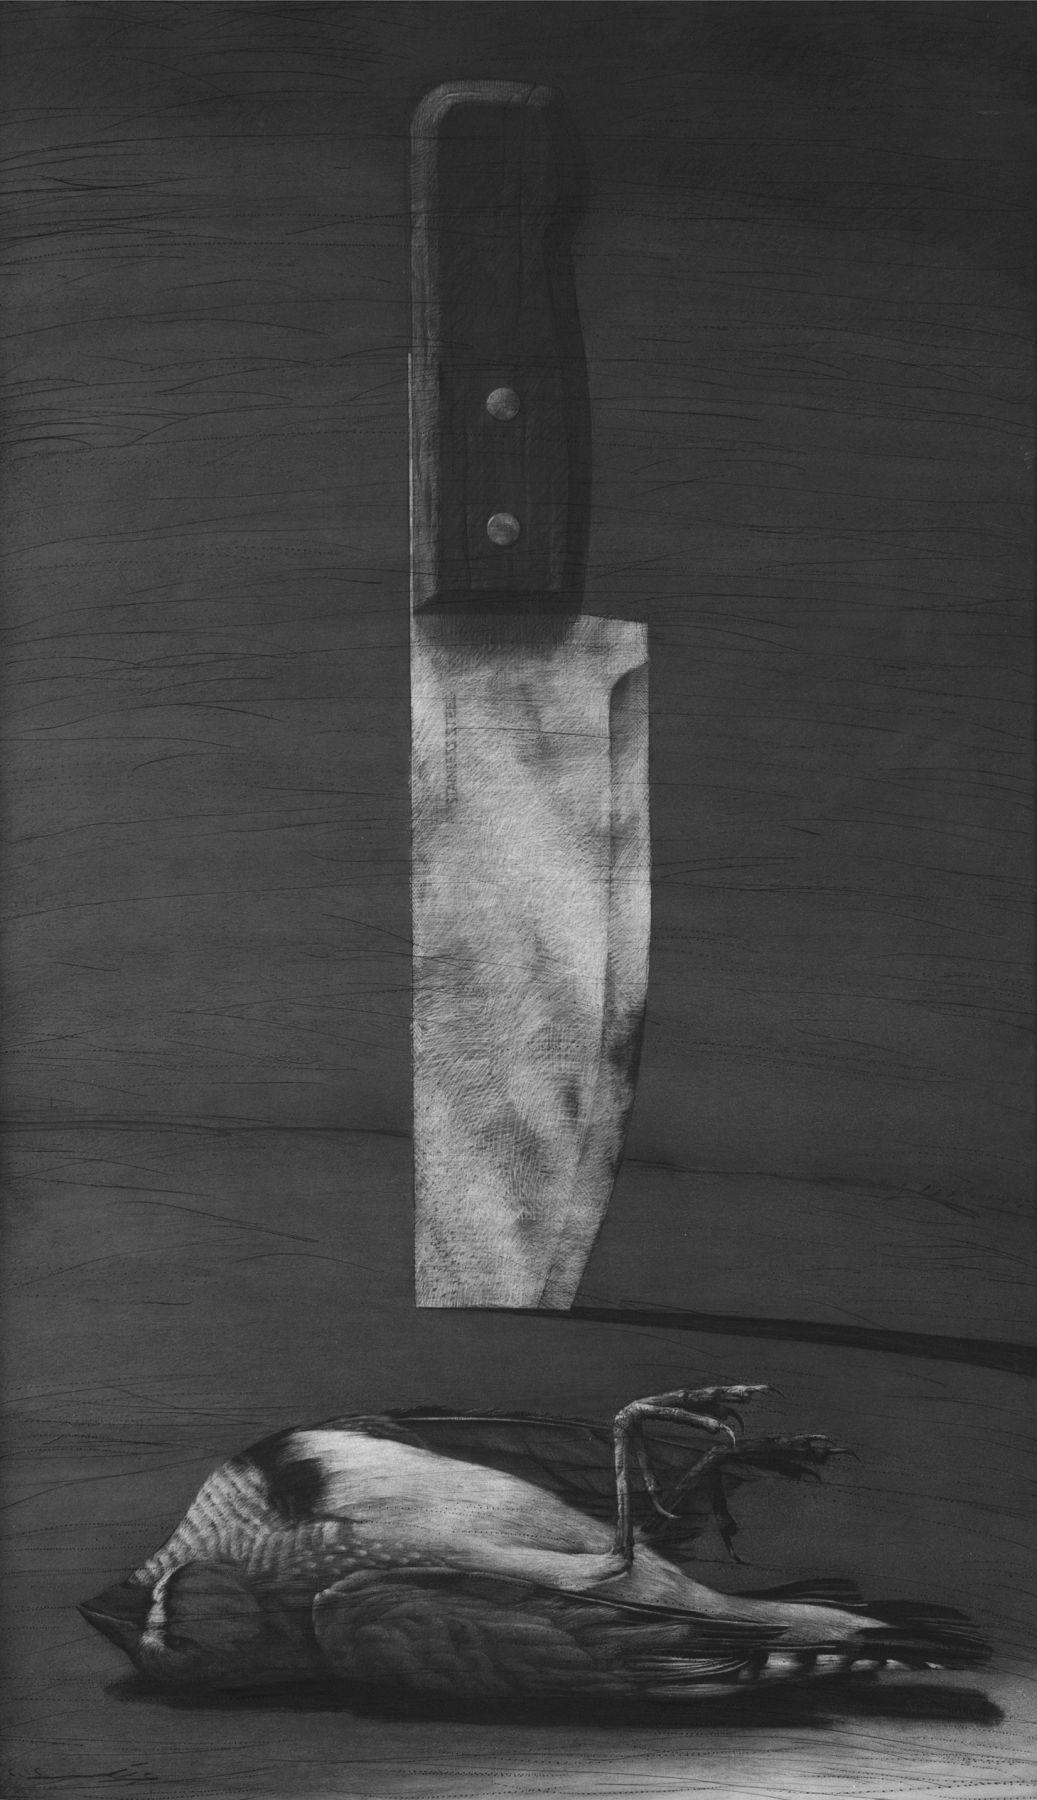 Bird and Knife